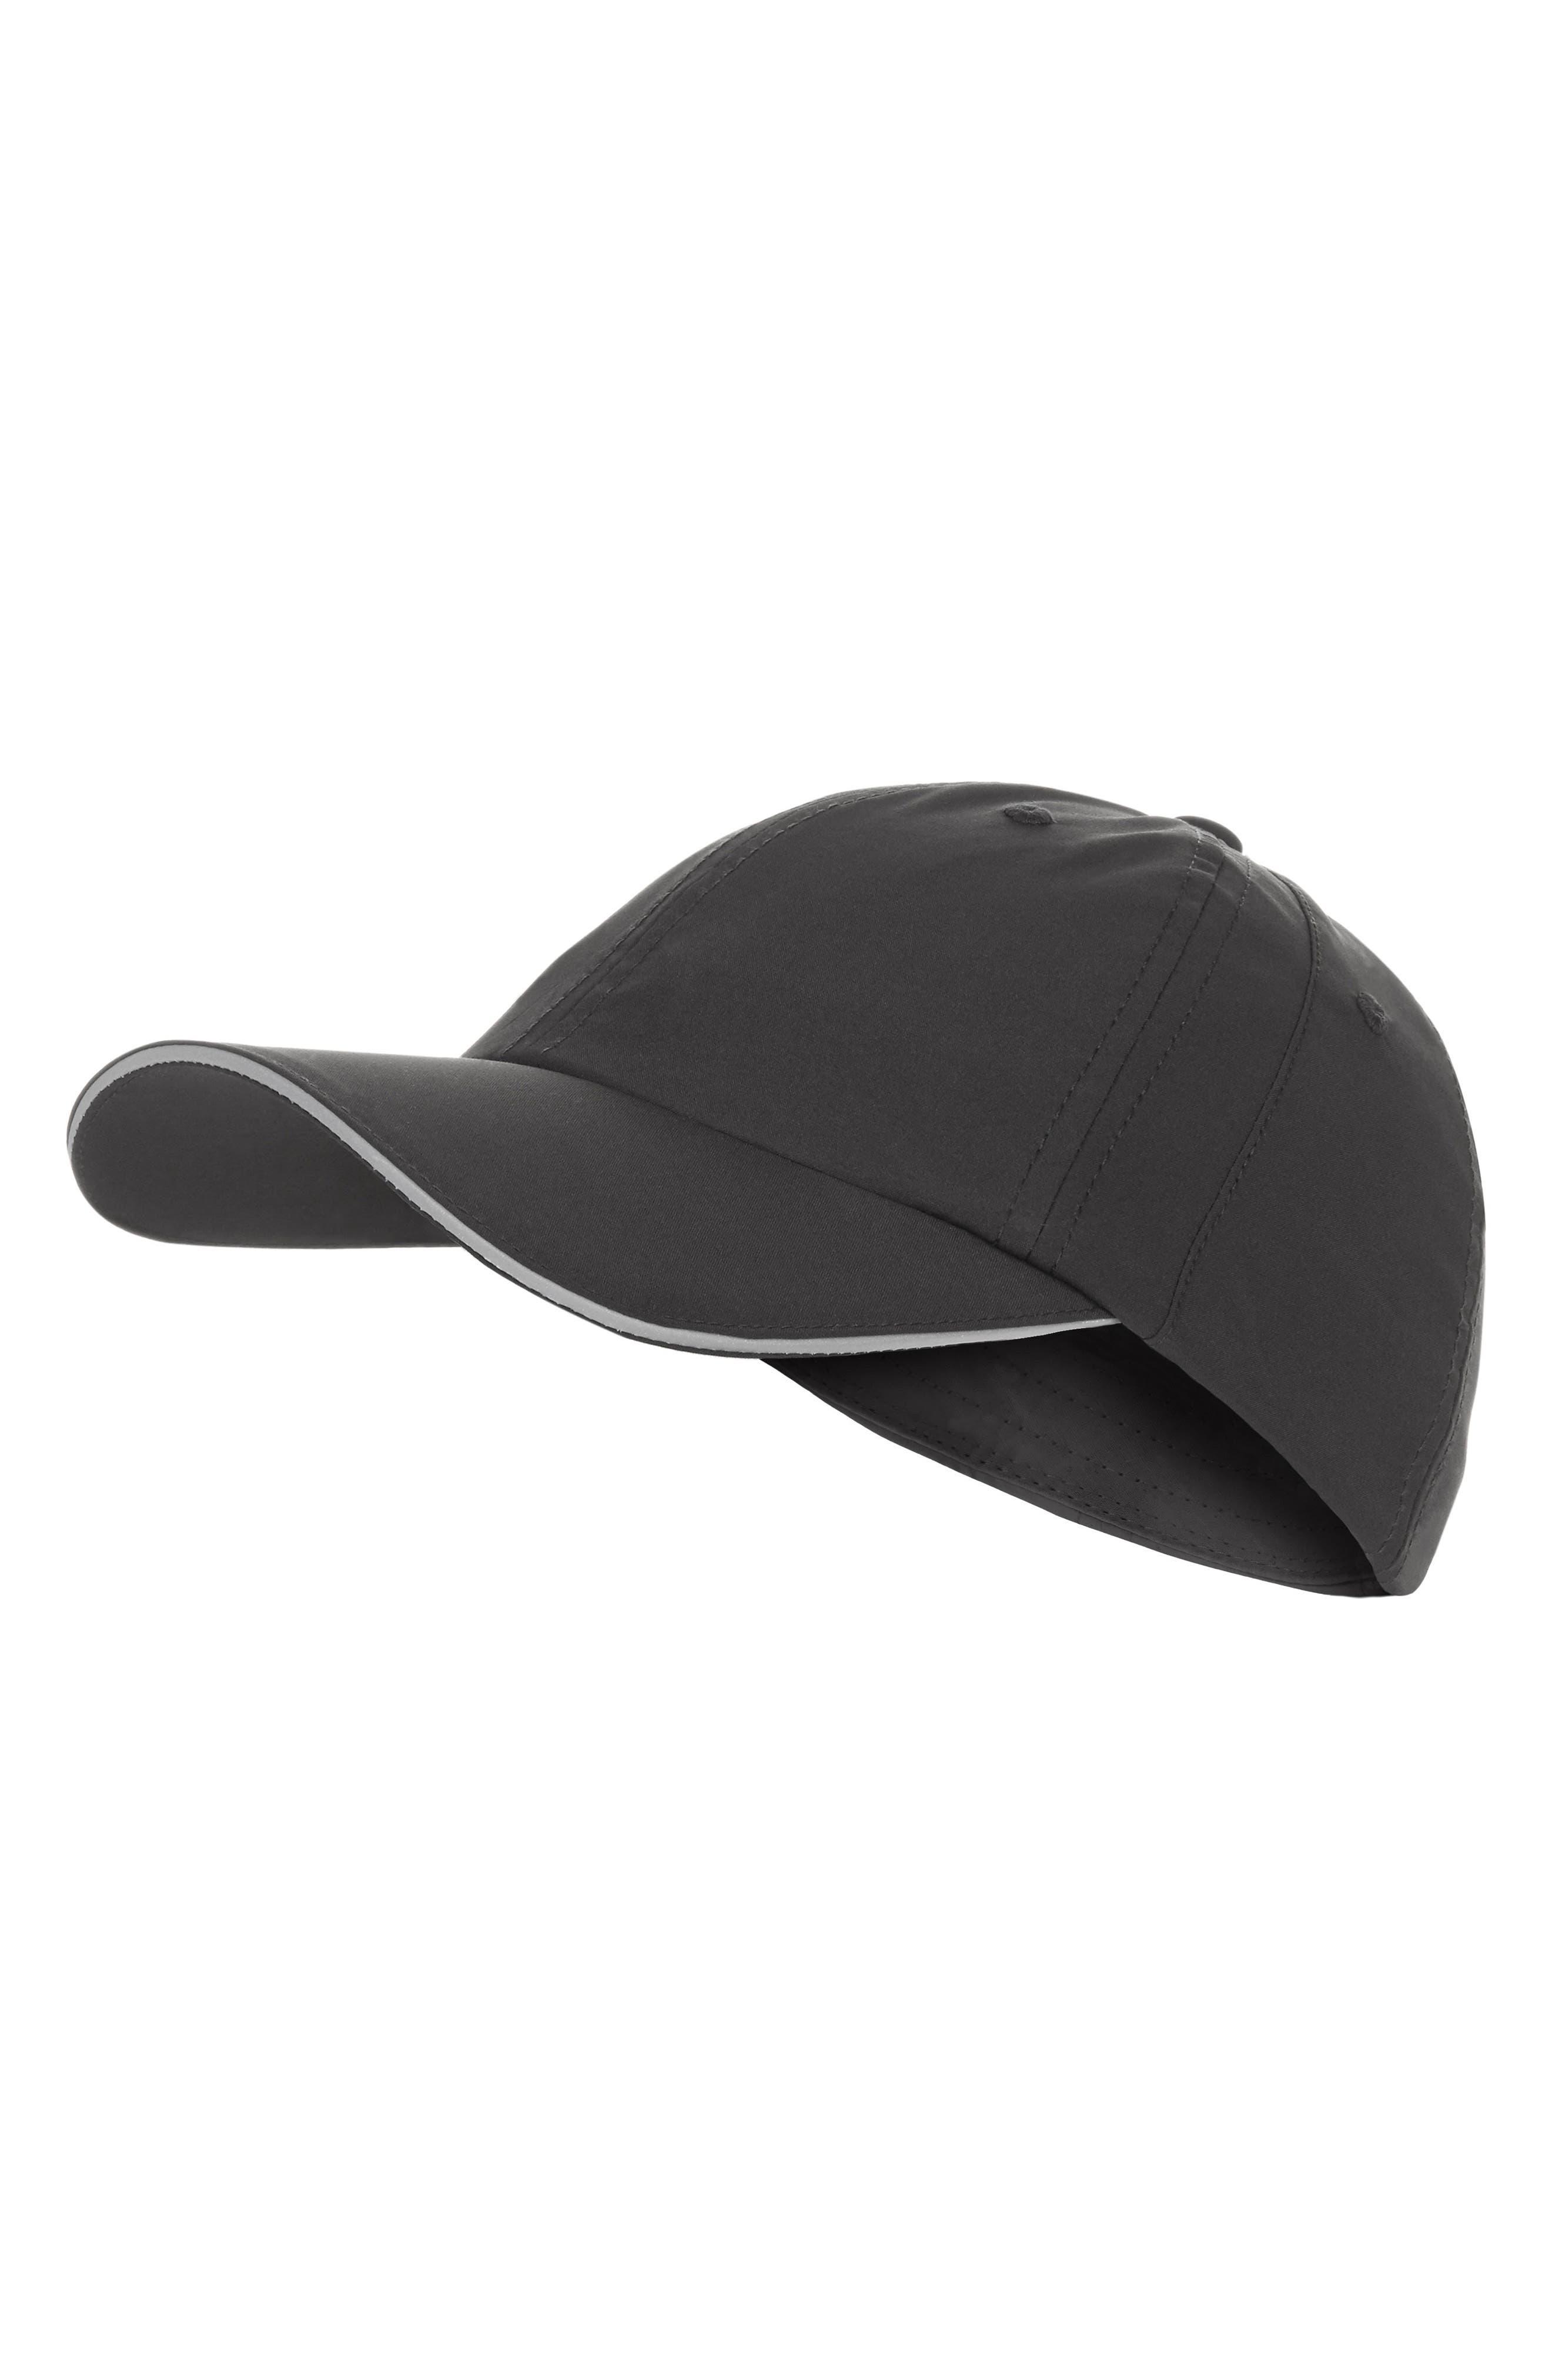 Swifie Running Cap,                         Main,                         color, BLACK